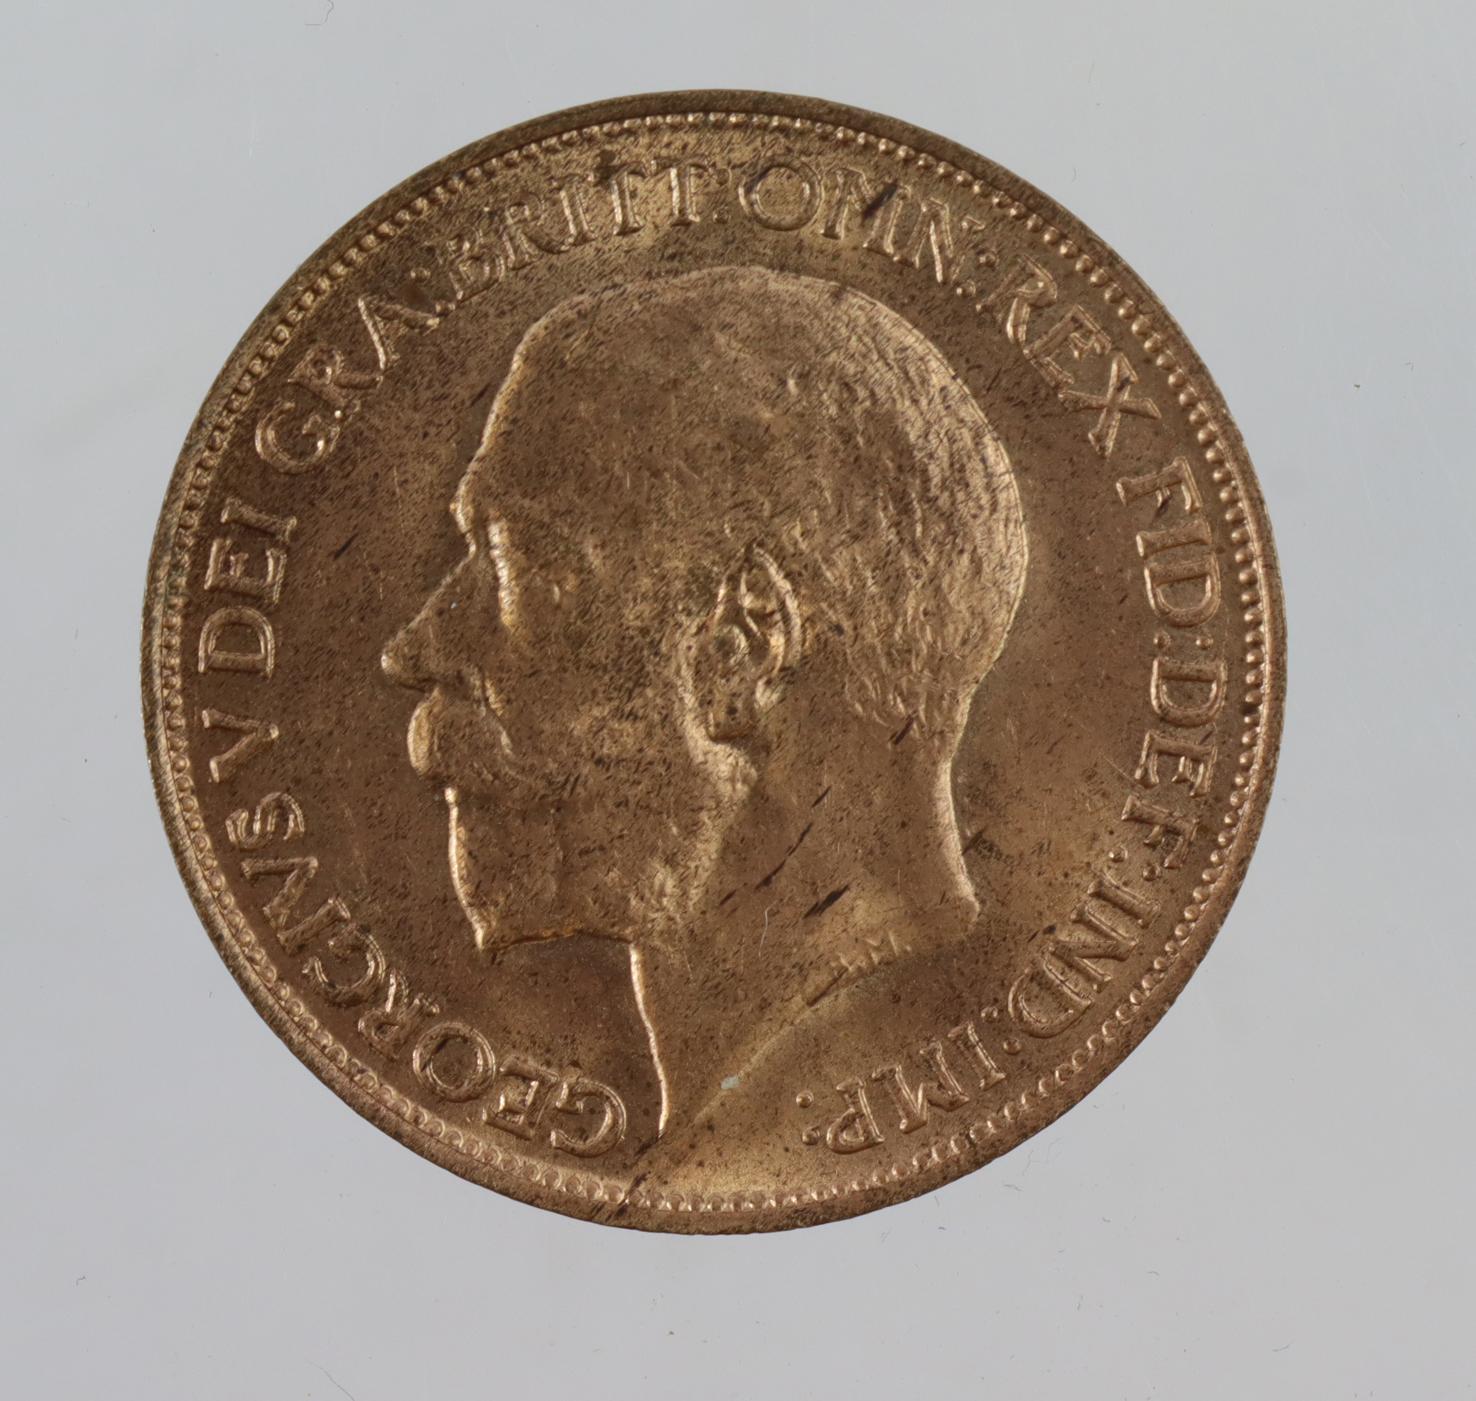 Halfpenny 1911 BU